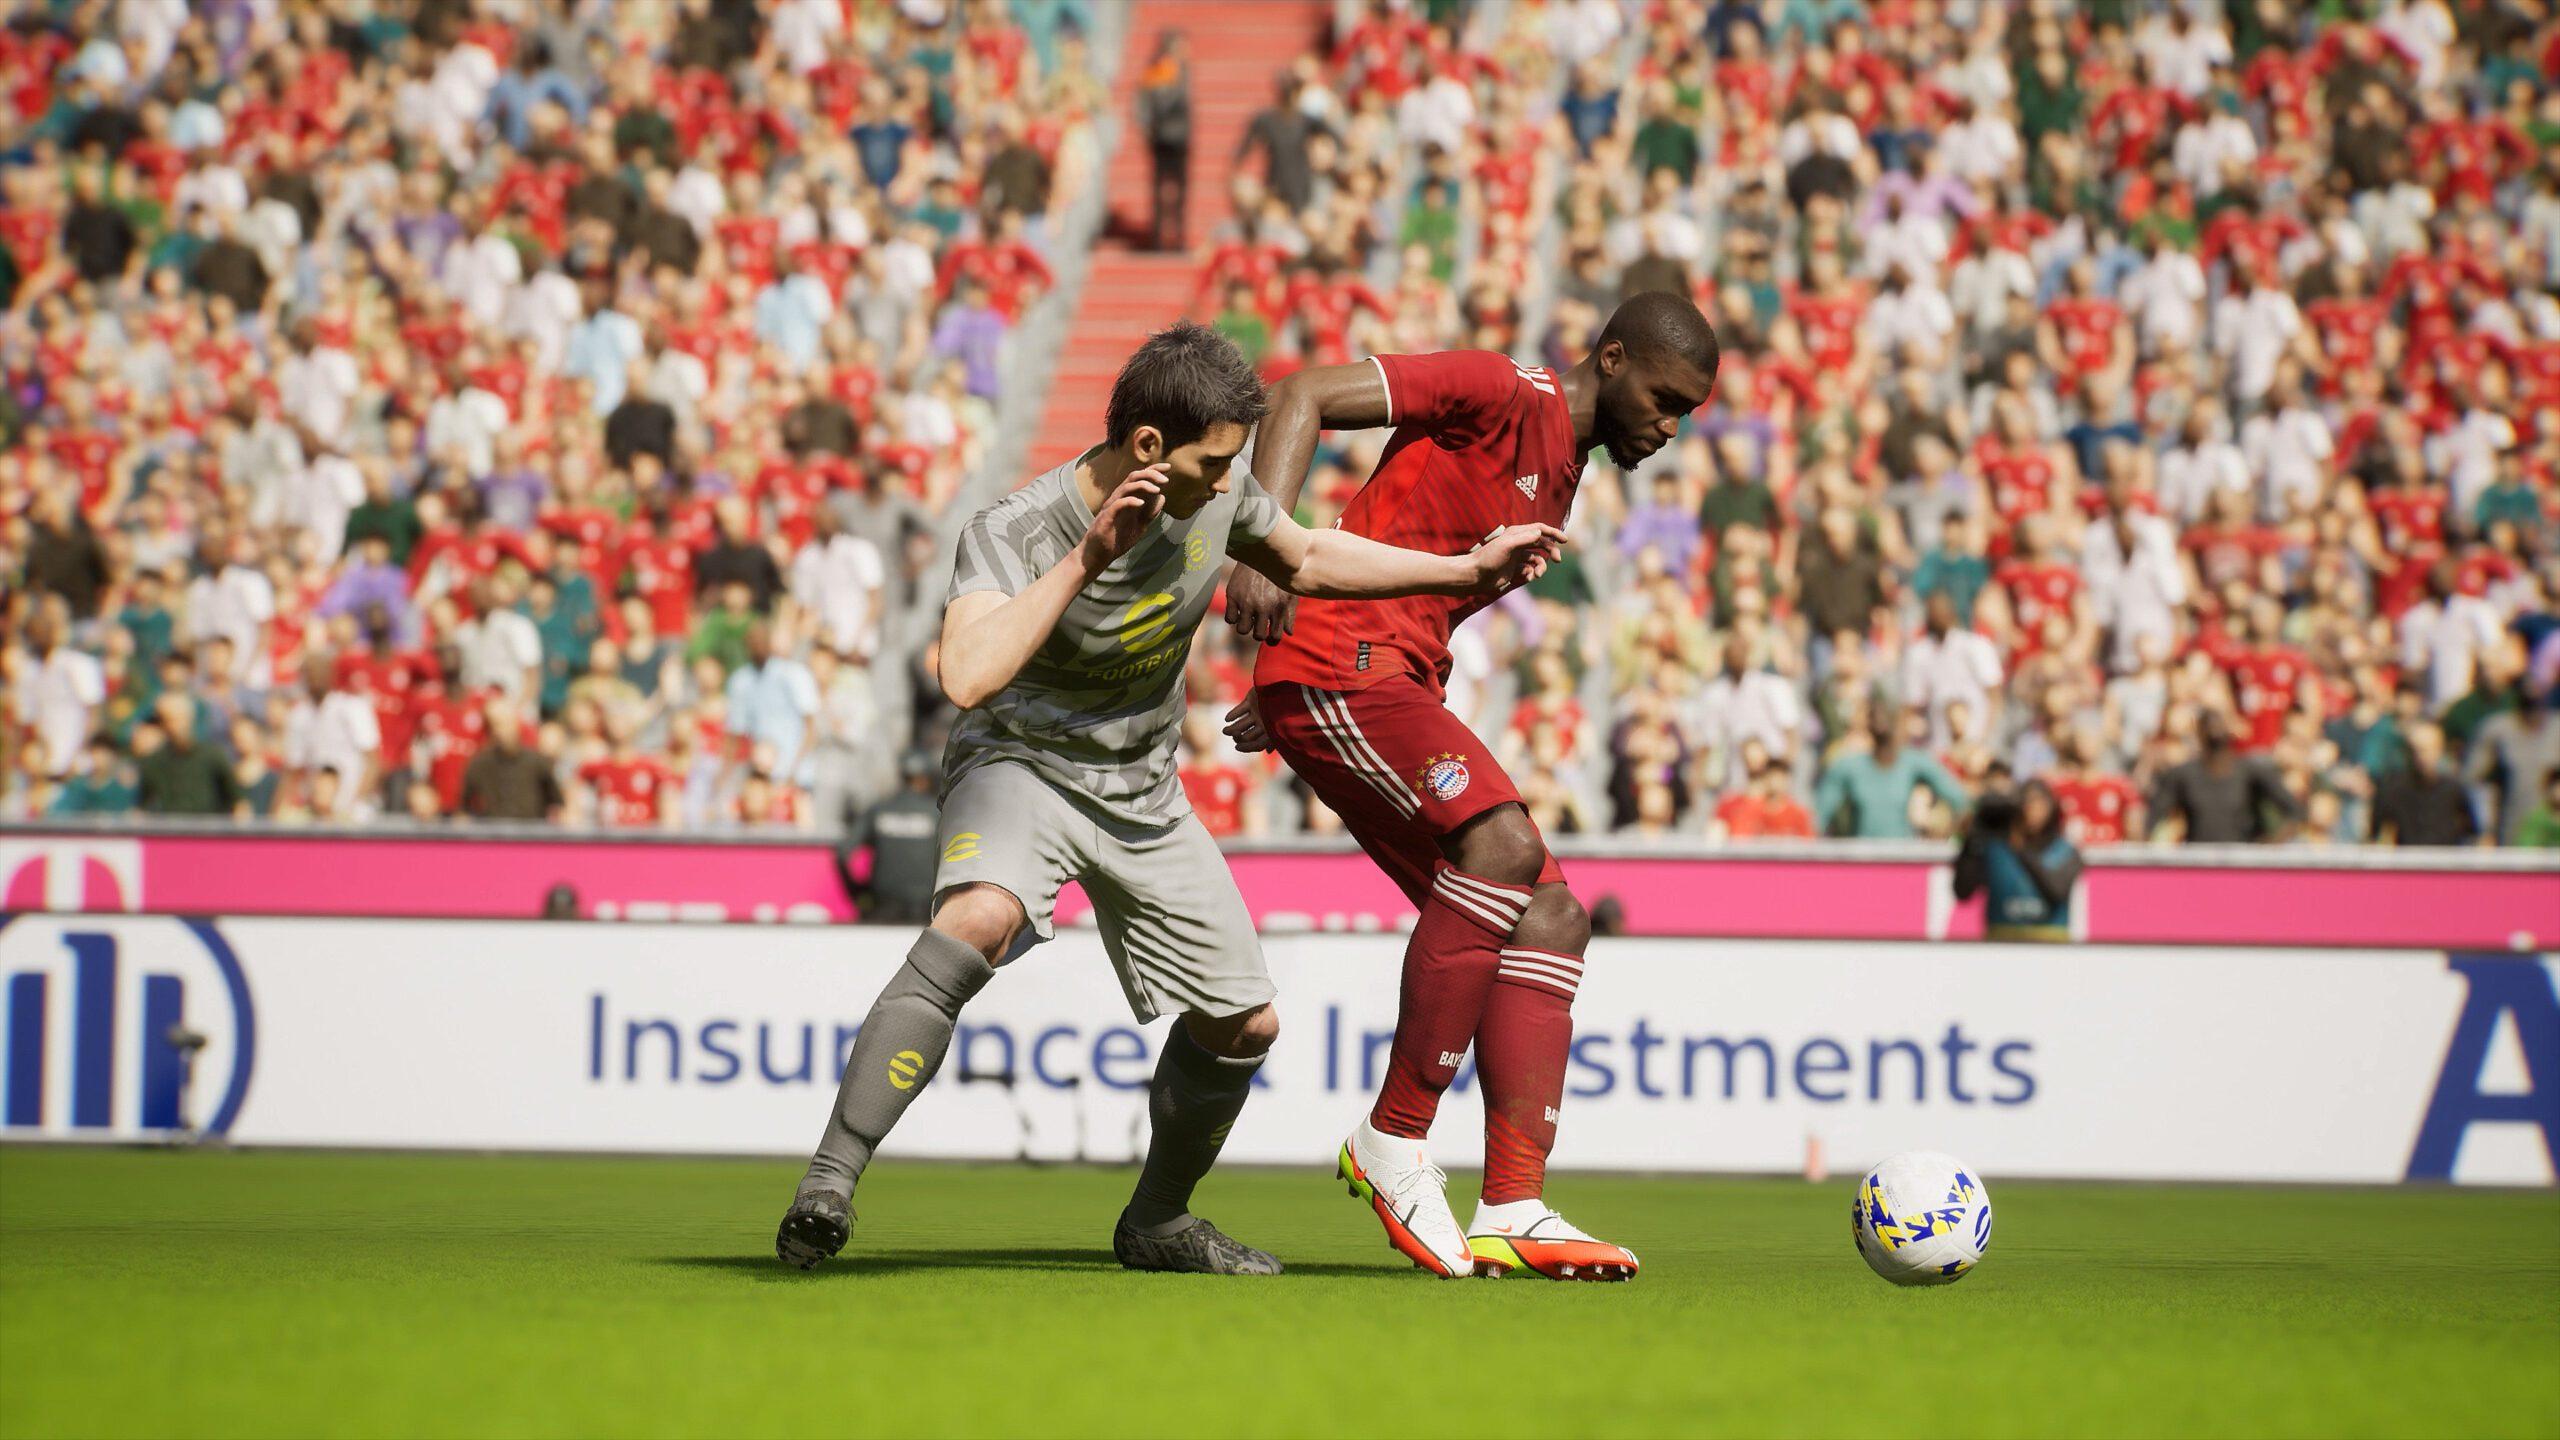 eFootball 2022 glitches